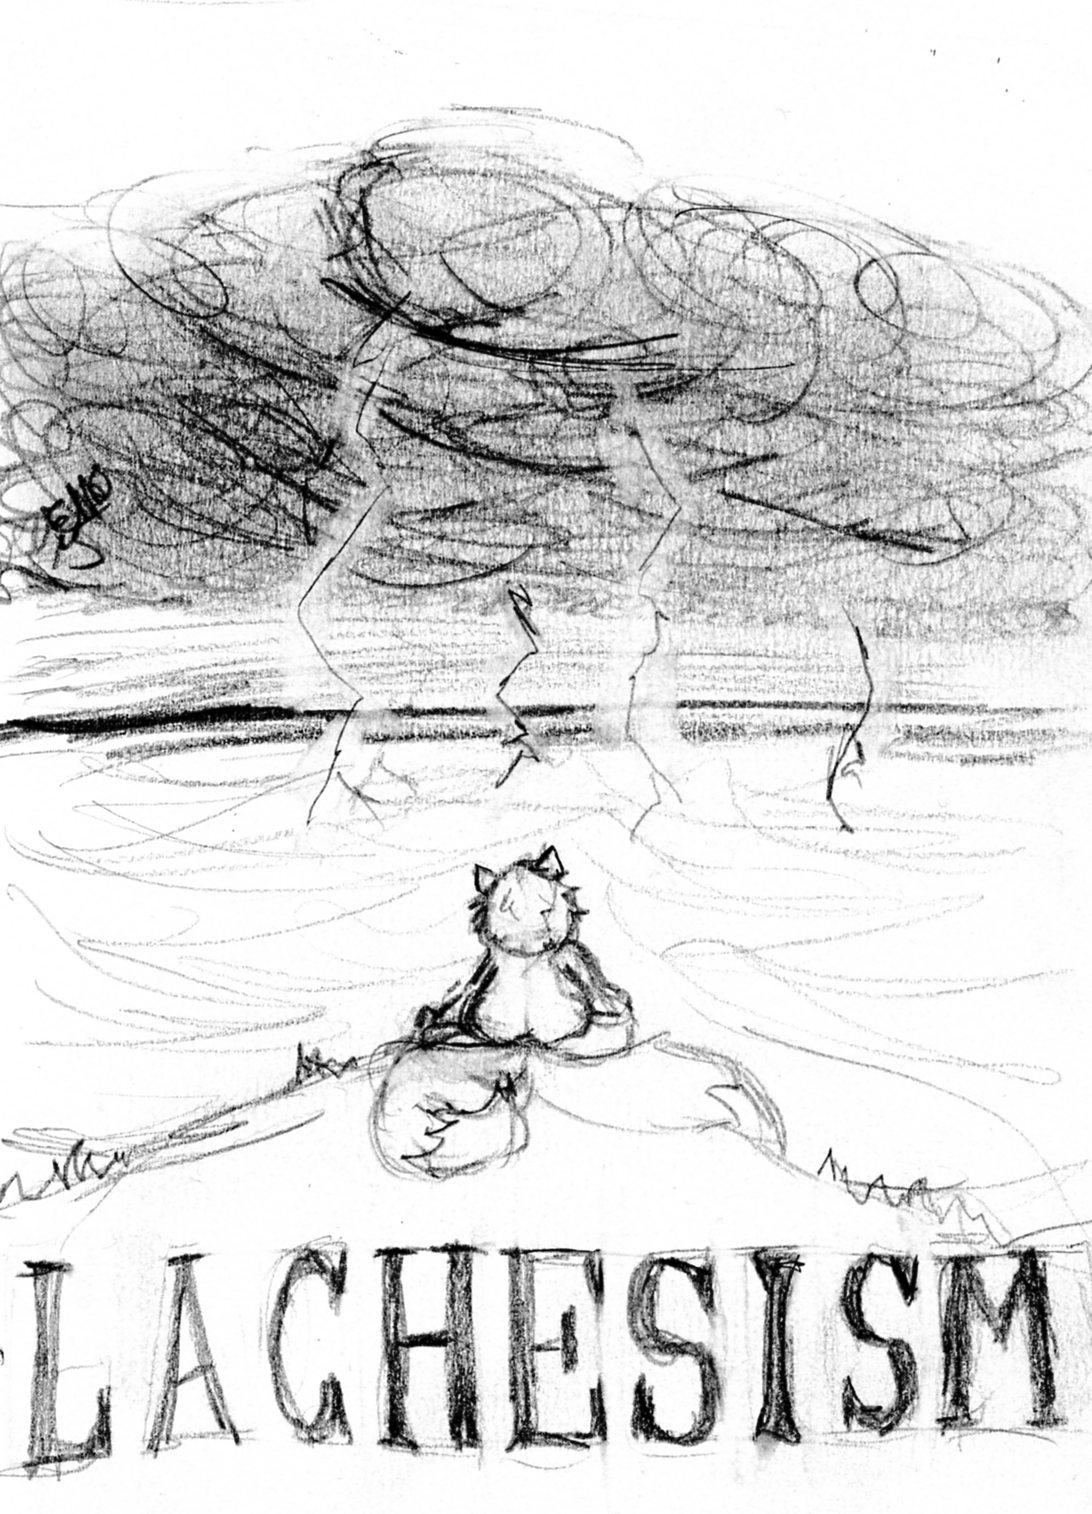 Lachesism